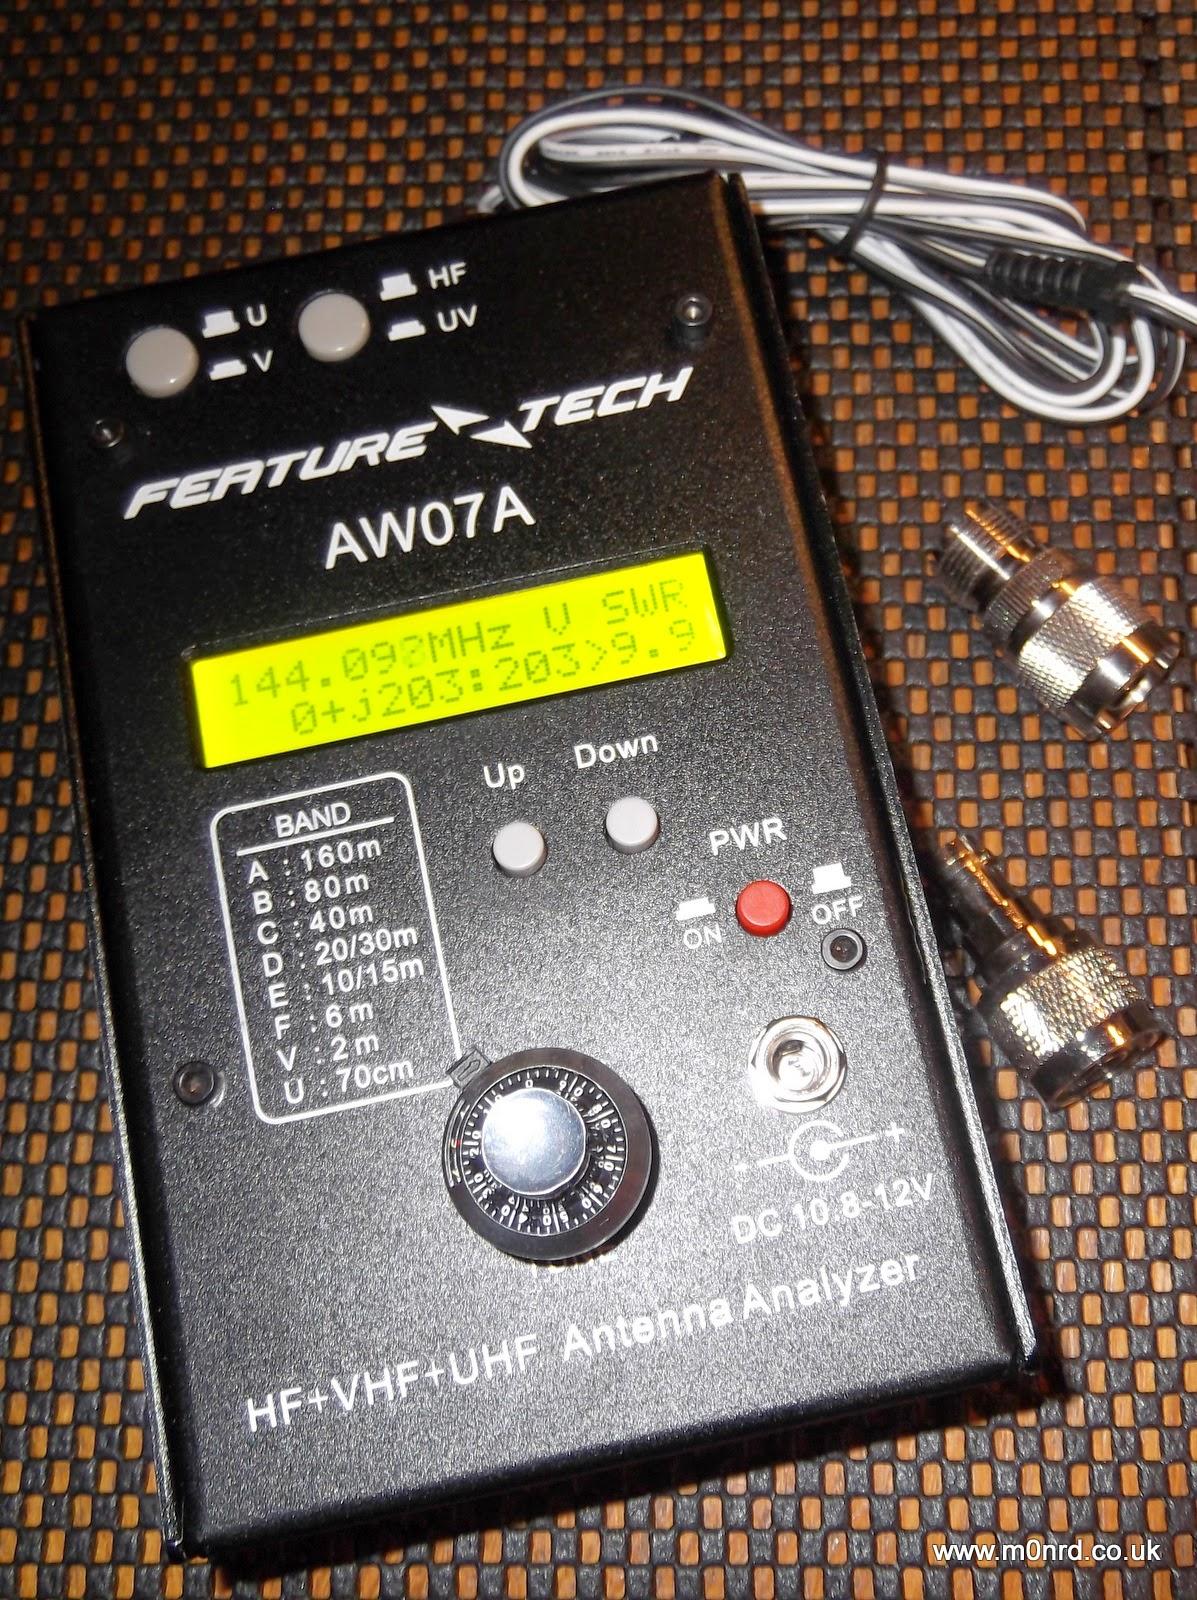 2018 AW07A HF//VHF//UHF 160M Impedance SWR Antenna Analyzer For Ham Radio